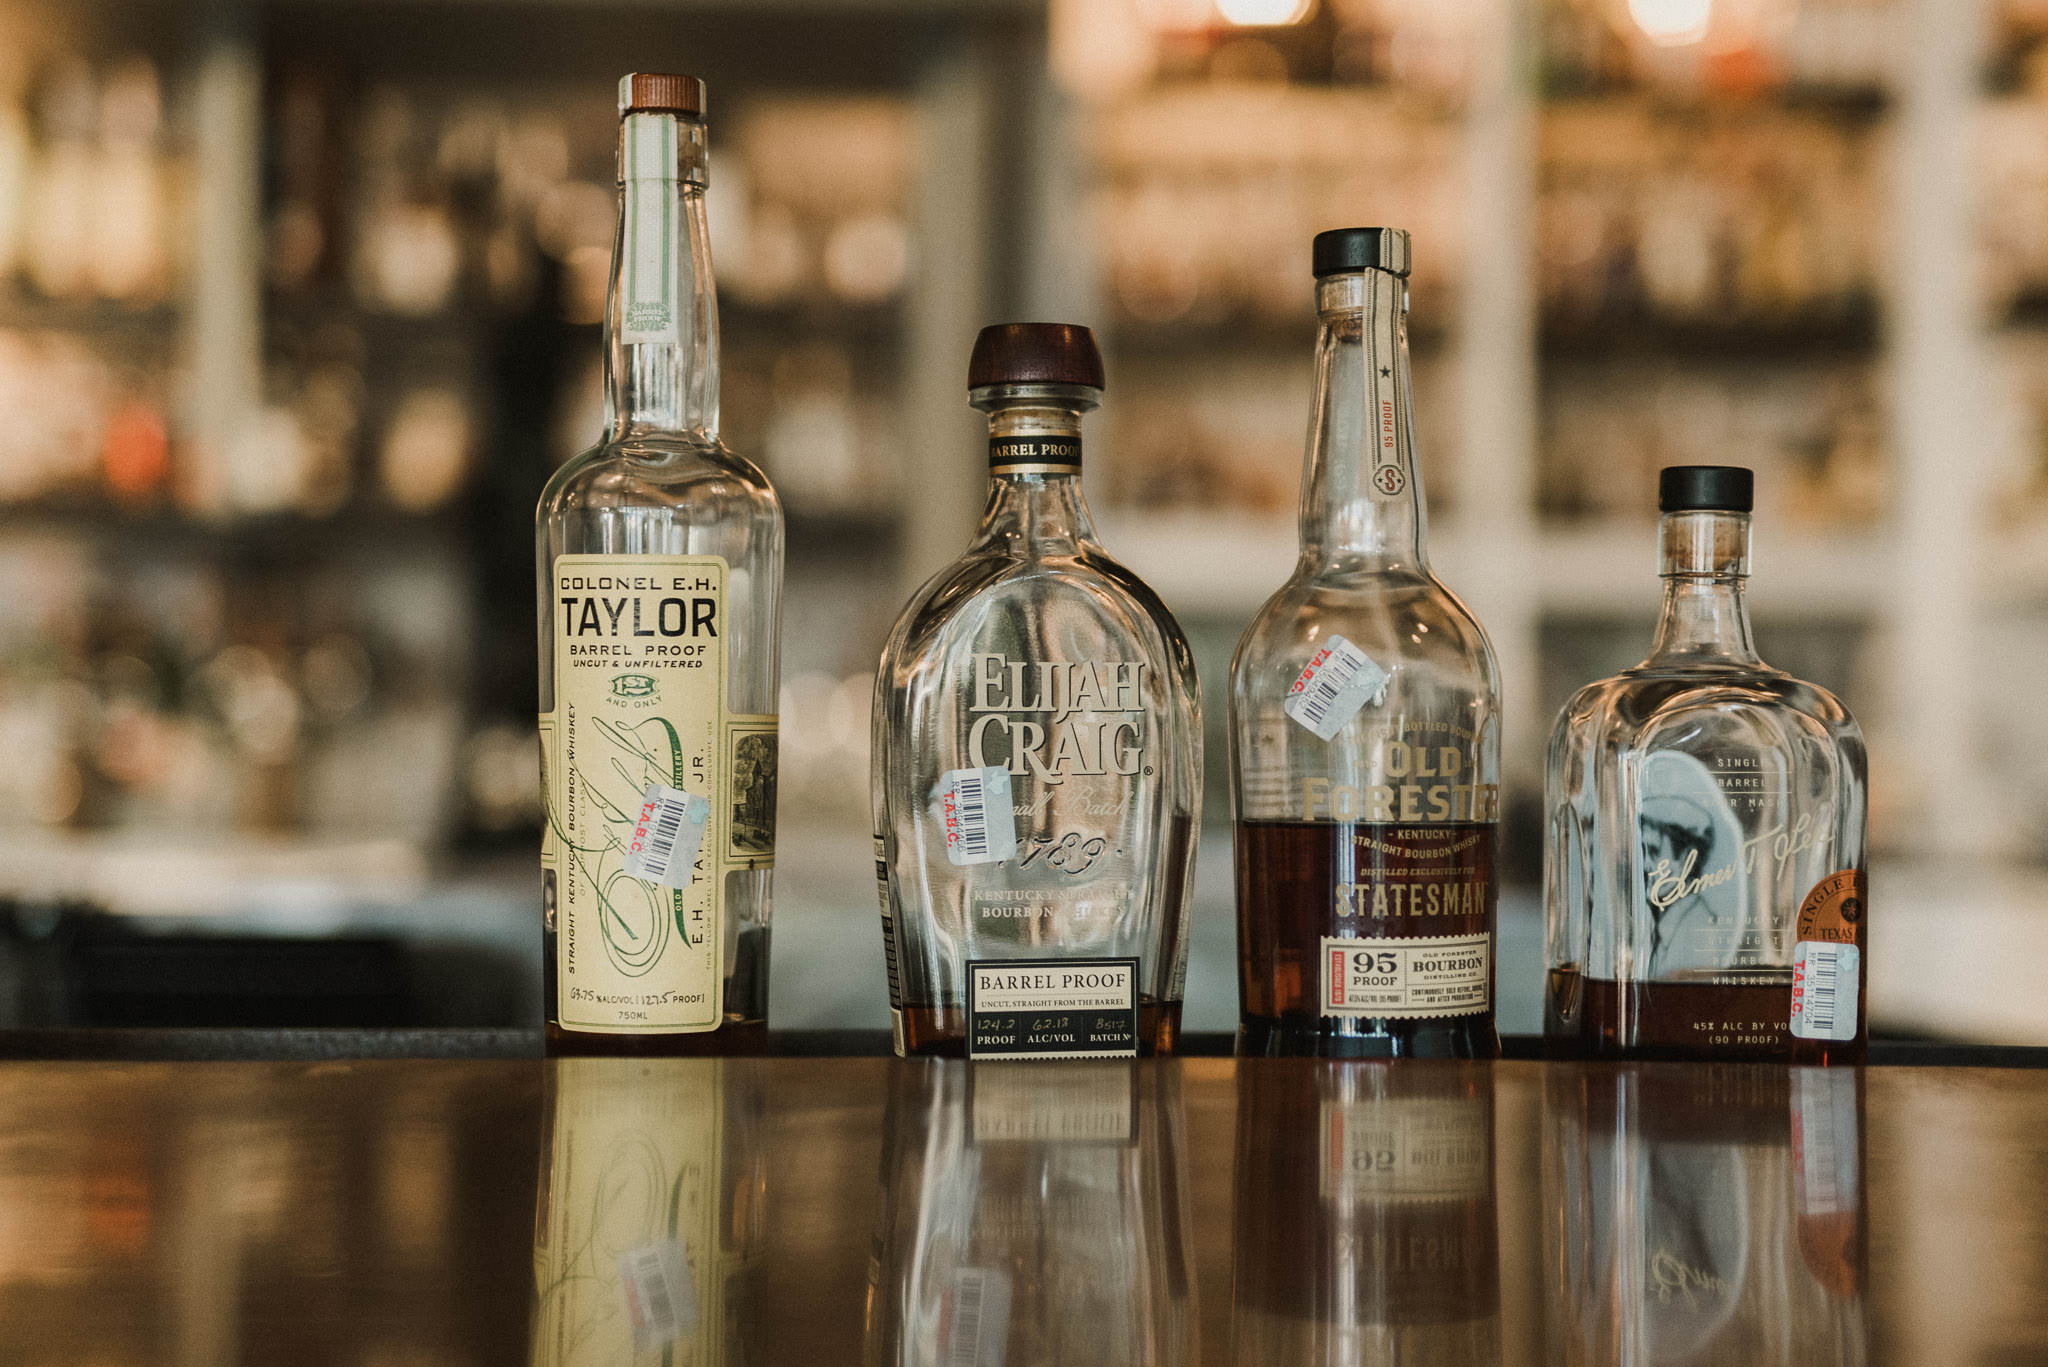 julep-bar-lifestyle-houston-cocktail-photographer